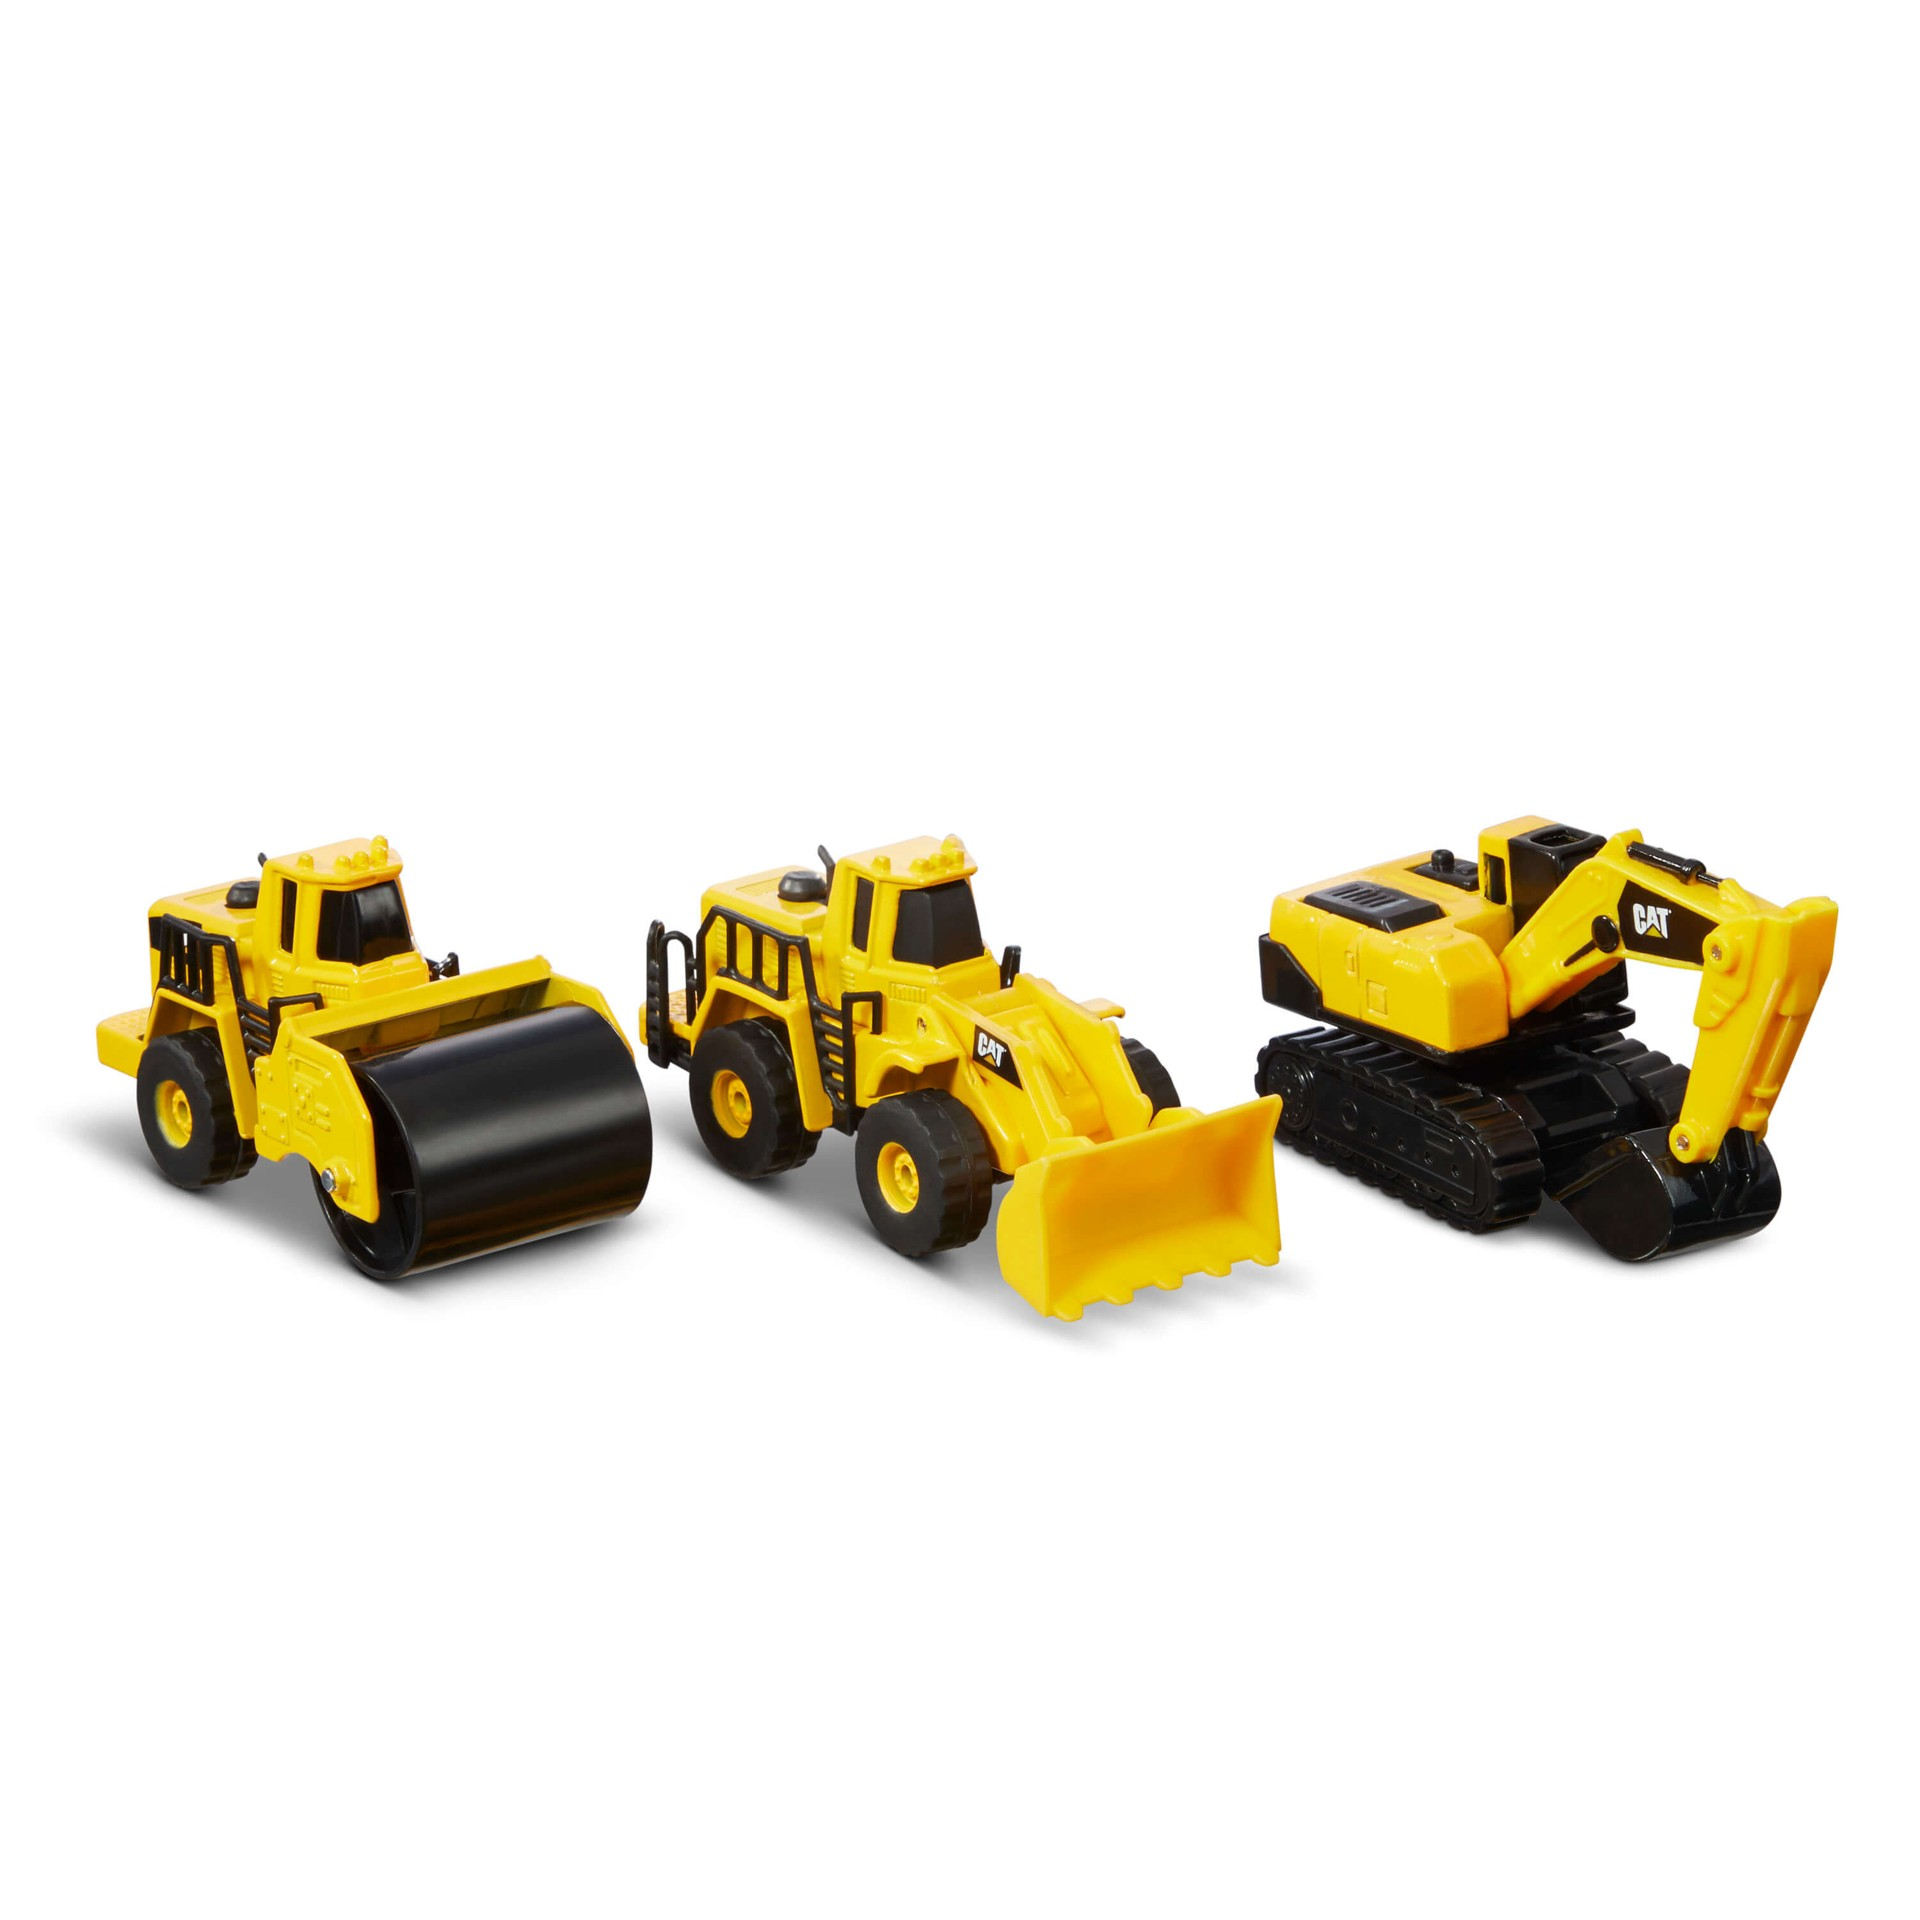 Cat - Metal 3-Pack Wheel Loader, Excavator, Steam Roller (82274)